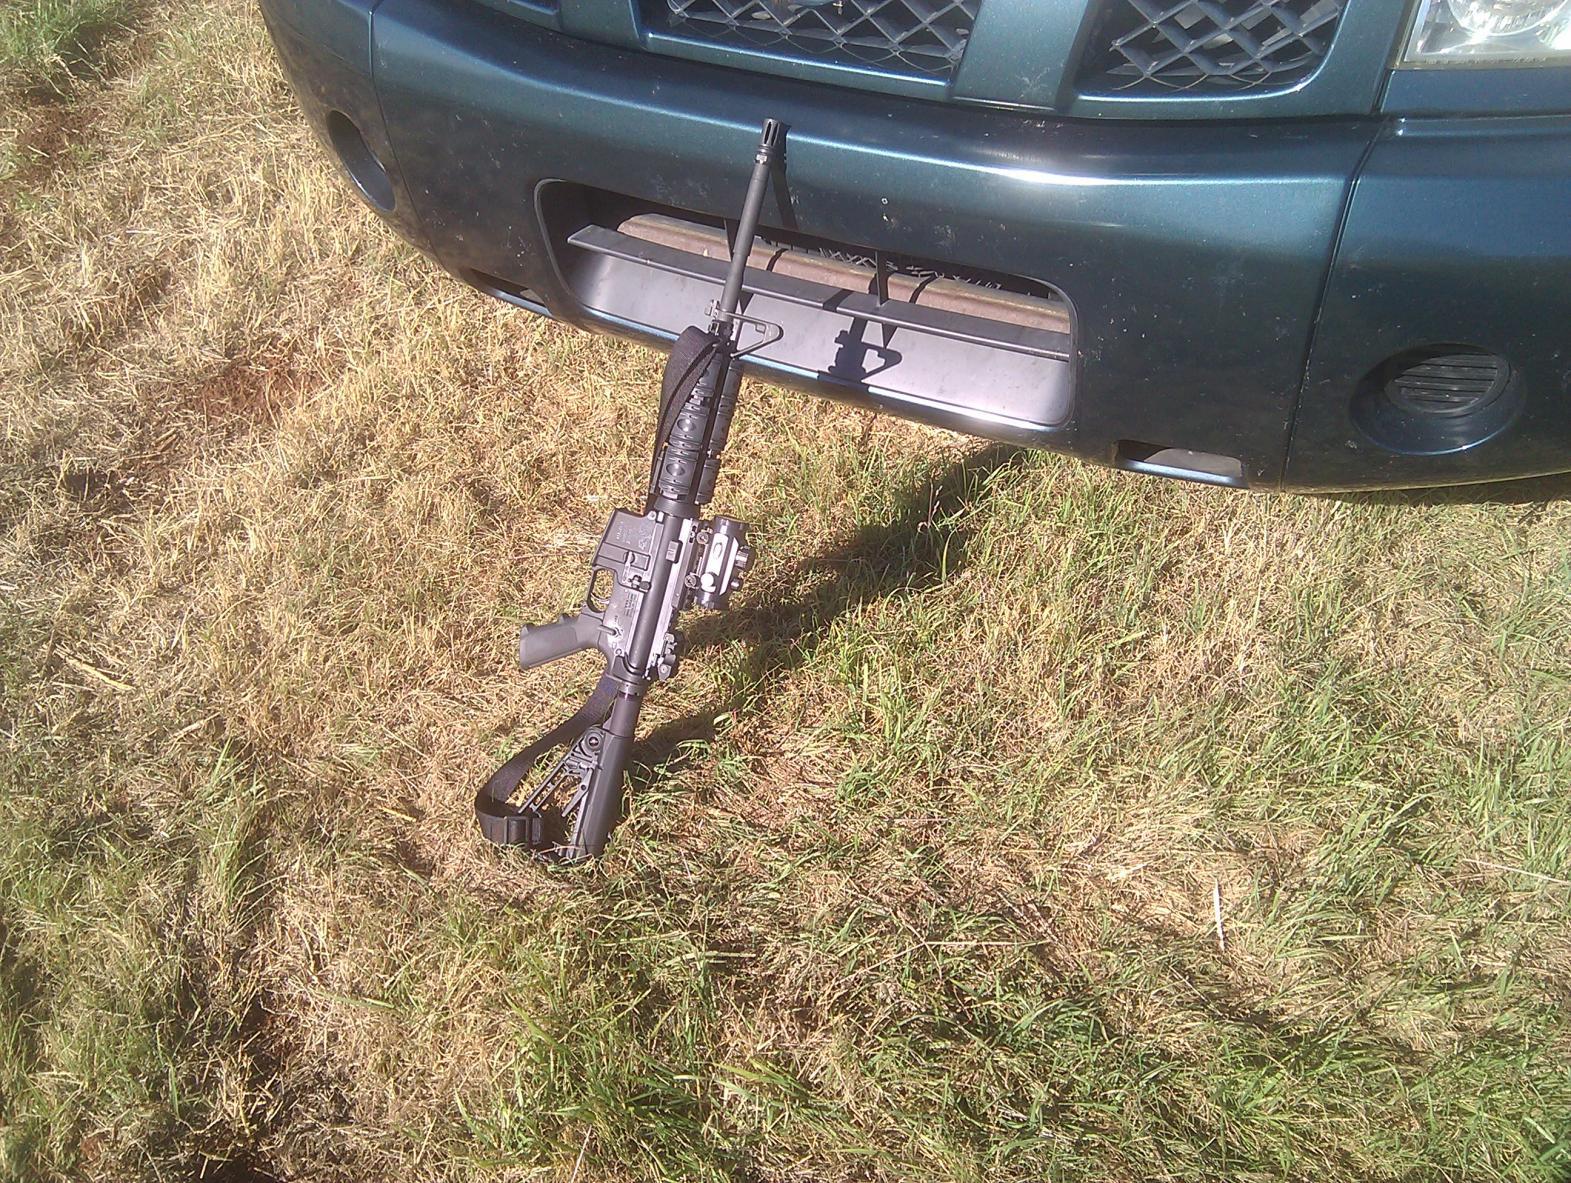 Evil Black Rifle Disease Strikes Again (Photo)-colt1.jpg